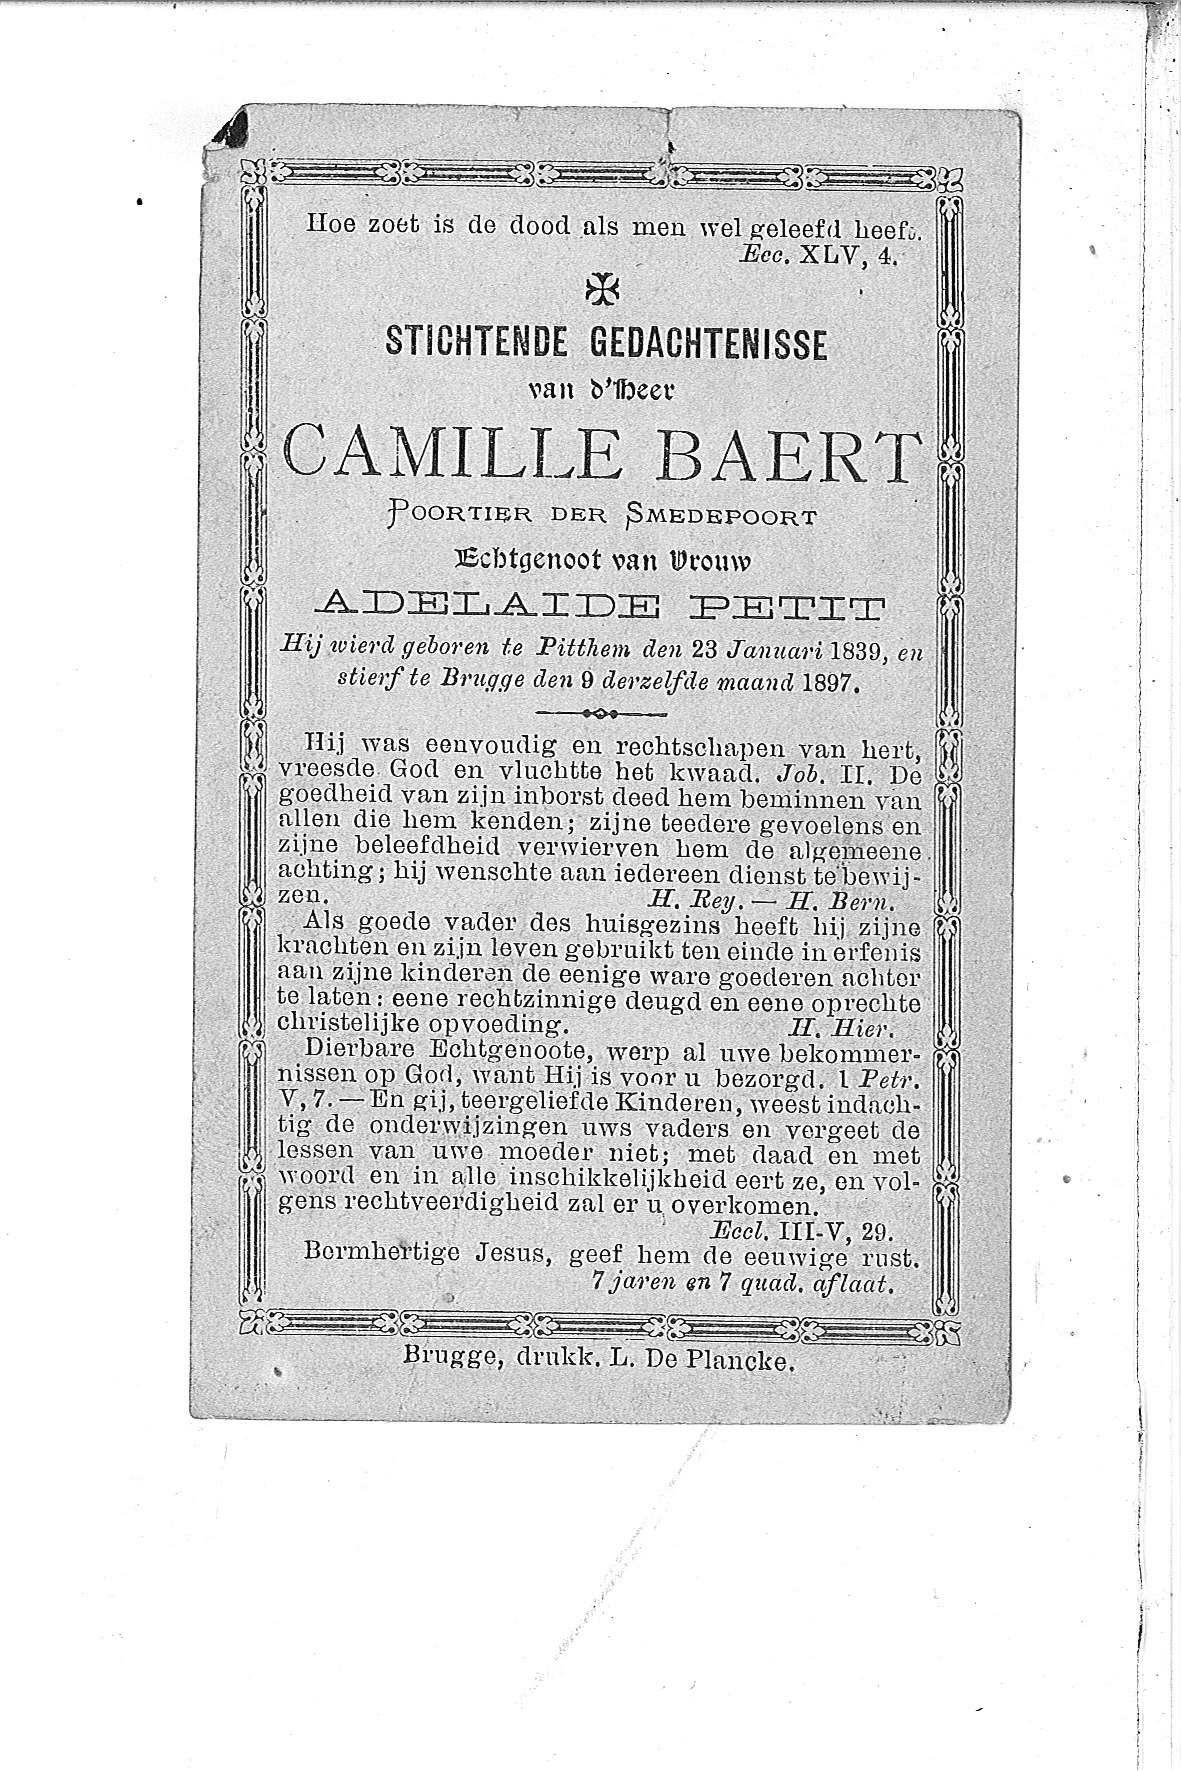 Camille(1897)20100929102653_00018.jpg